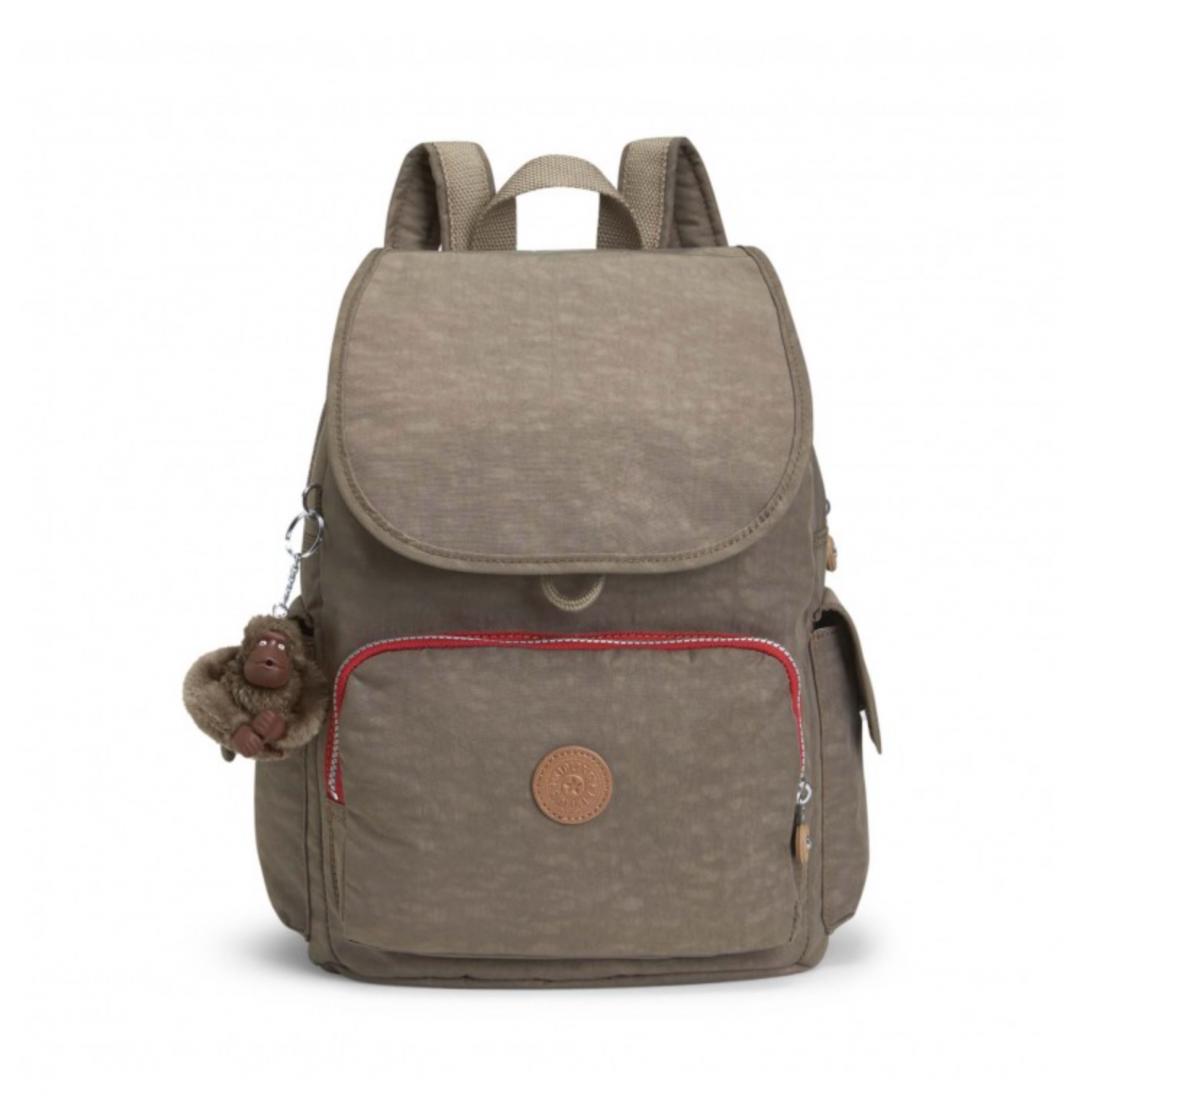 8e3c1487bd9 Kipling City Pack Backpack True Beige C